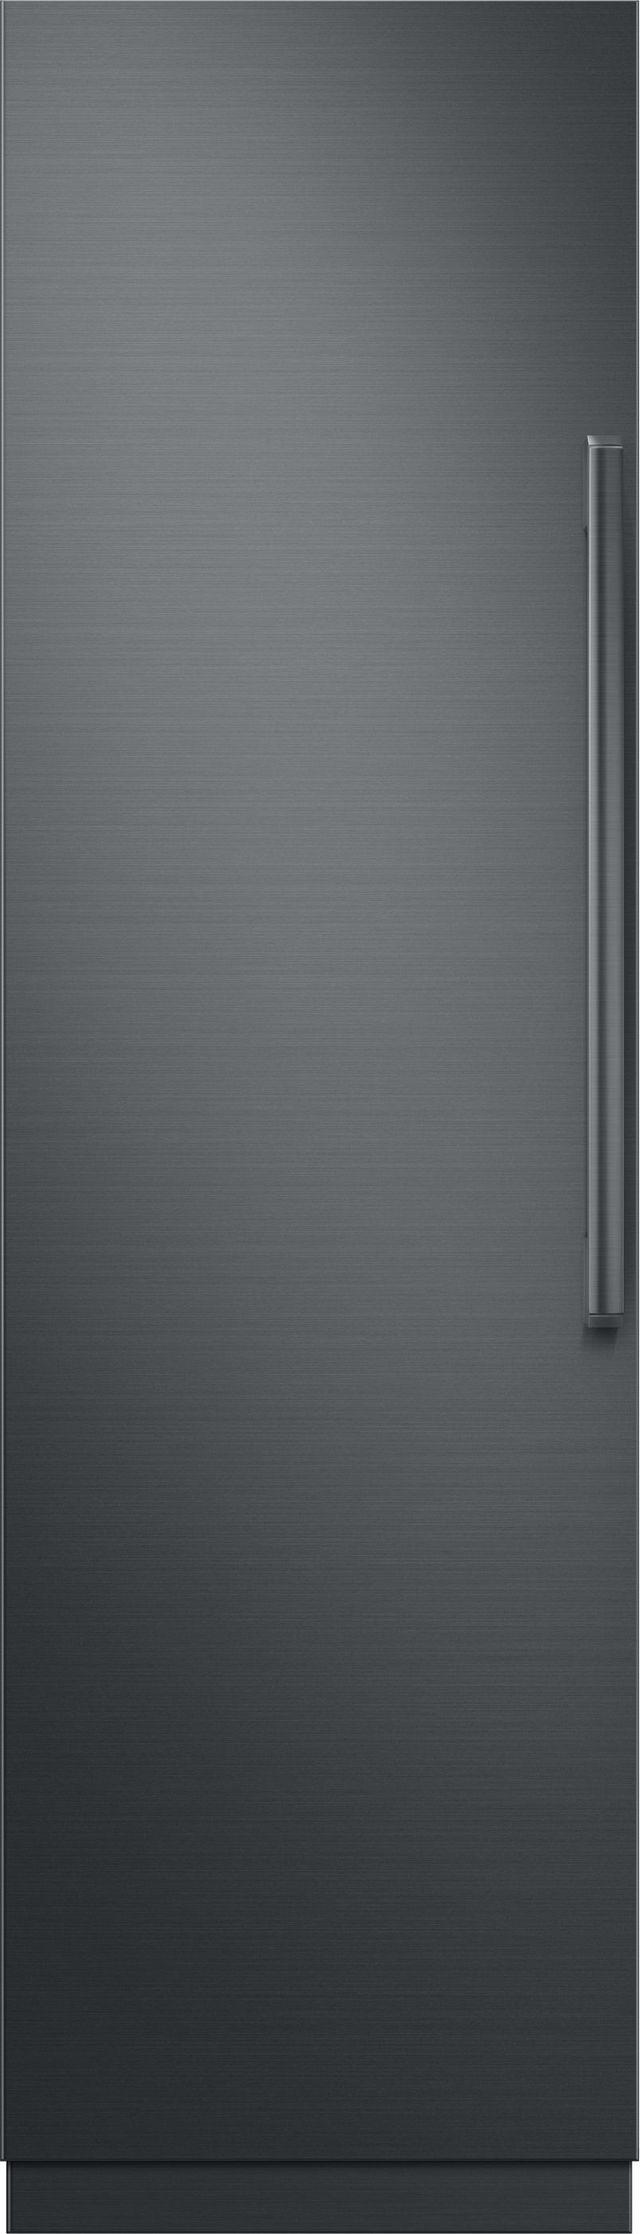 Dacor® Contemporary 13.7 Cu. Ft. Panel Ready All Refrigerator Column-DRR24980LAP